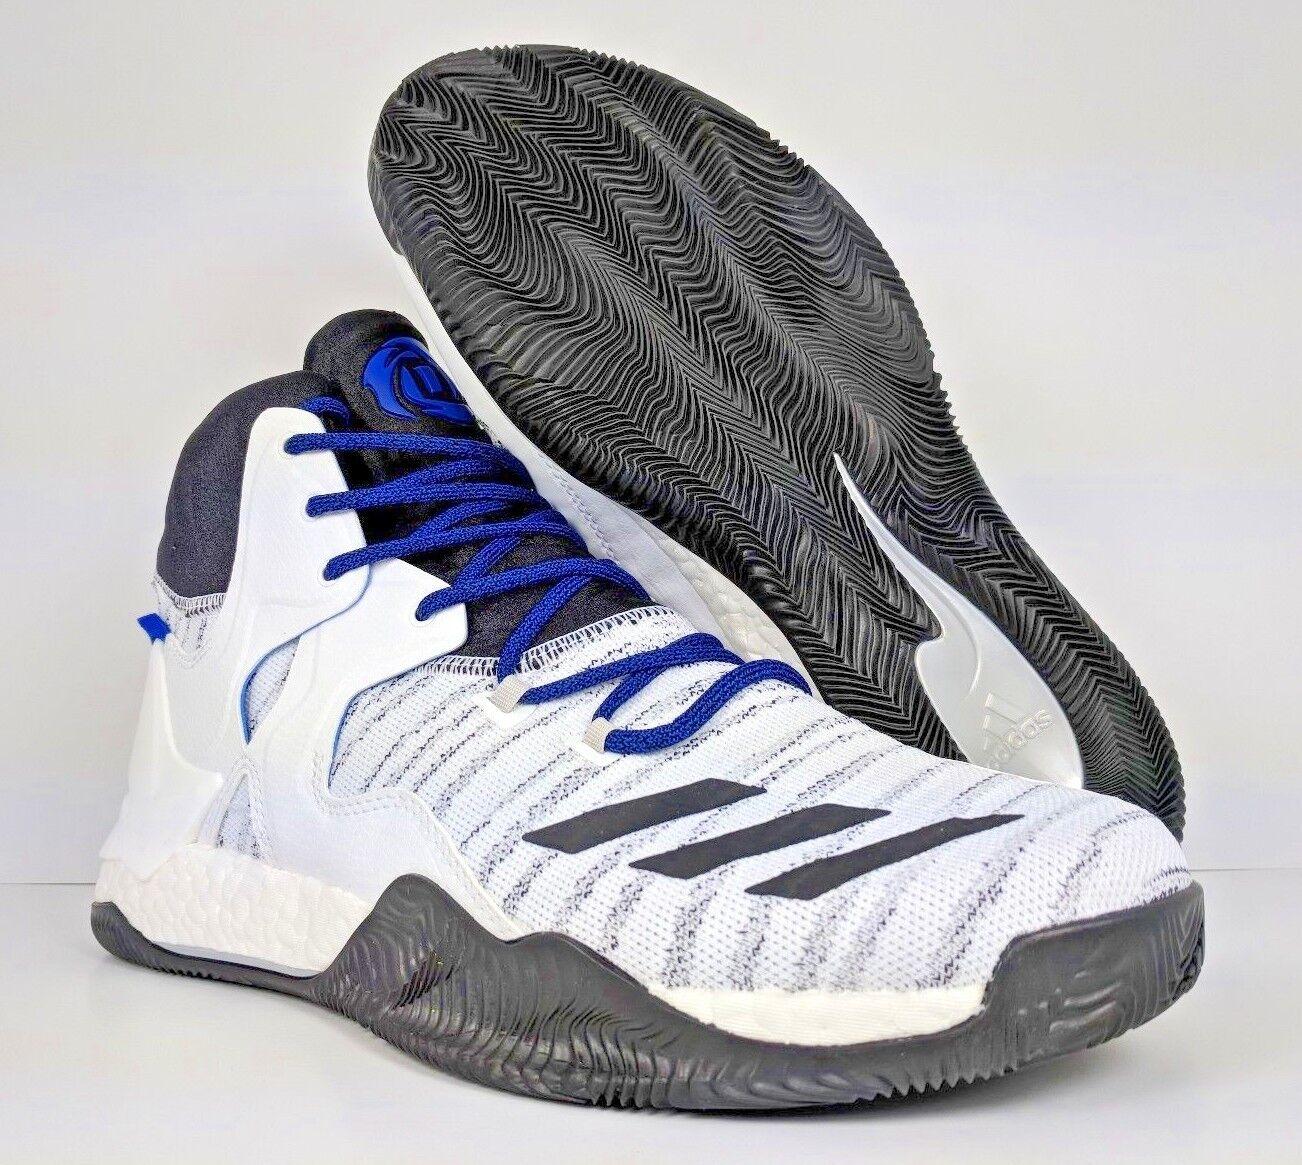 finest selection 531c9 f1c19 ... low cost adidas d rose 7 auftrieb primeknit pk weiß basketball blau weiß  pk schwarz sz